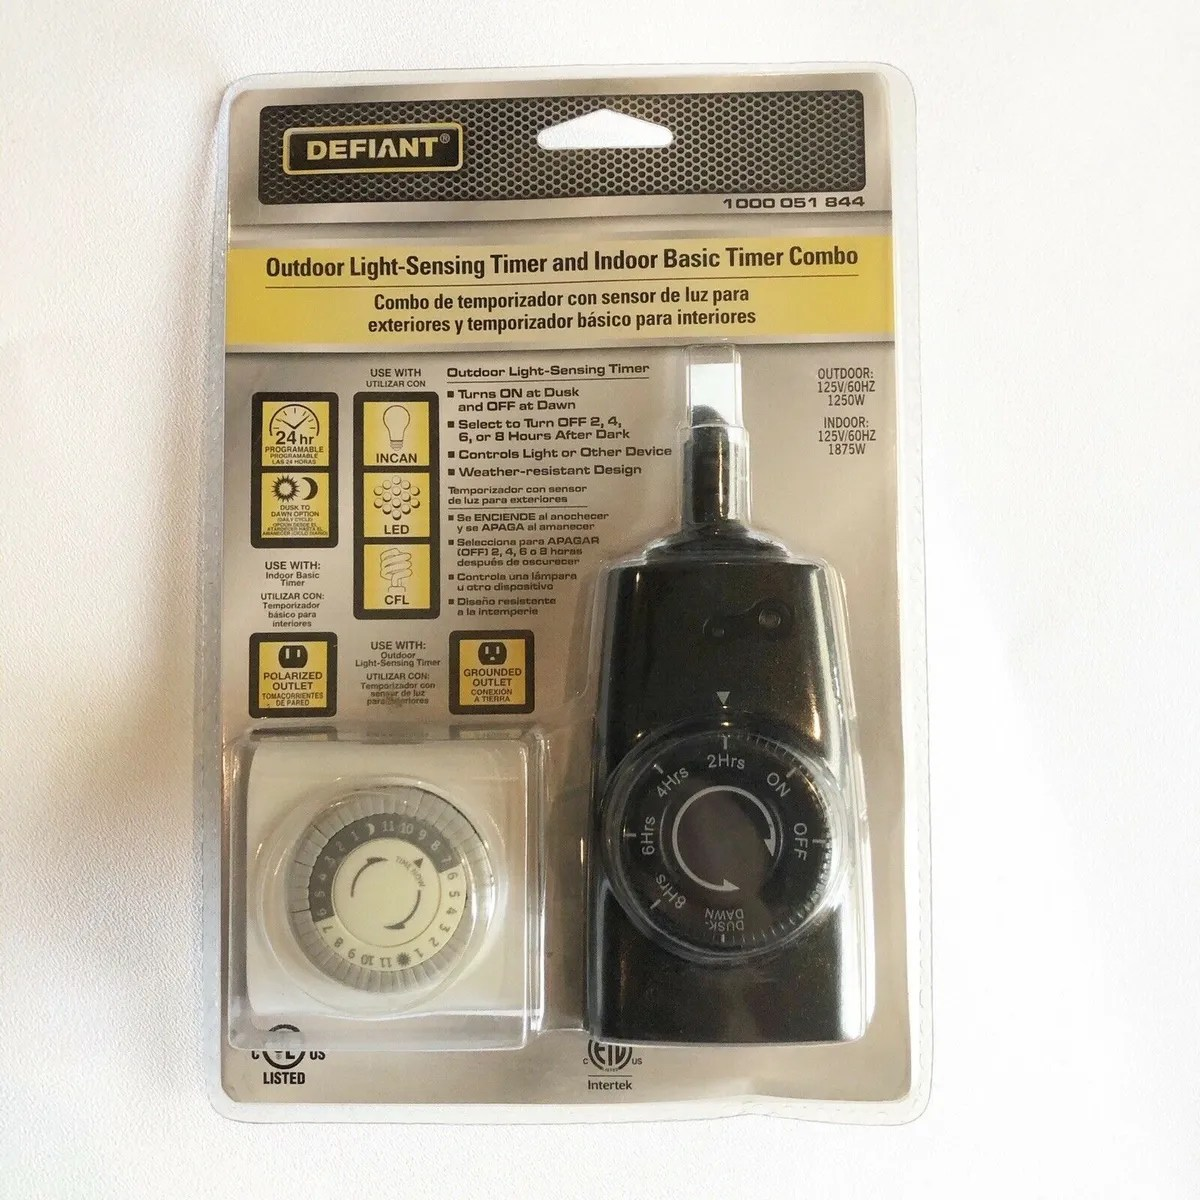 defiant outdoor light sensing timer